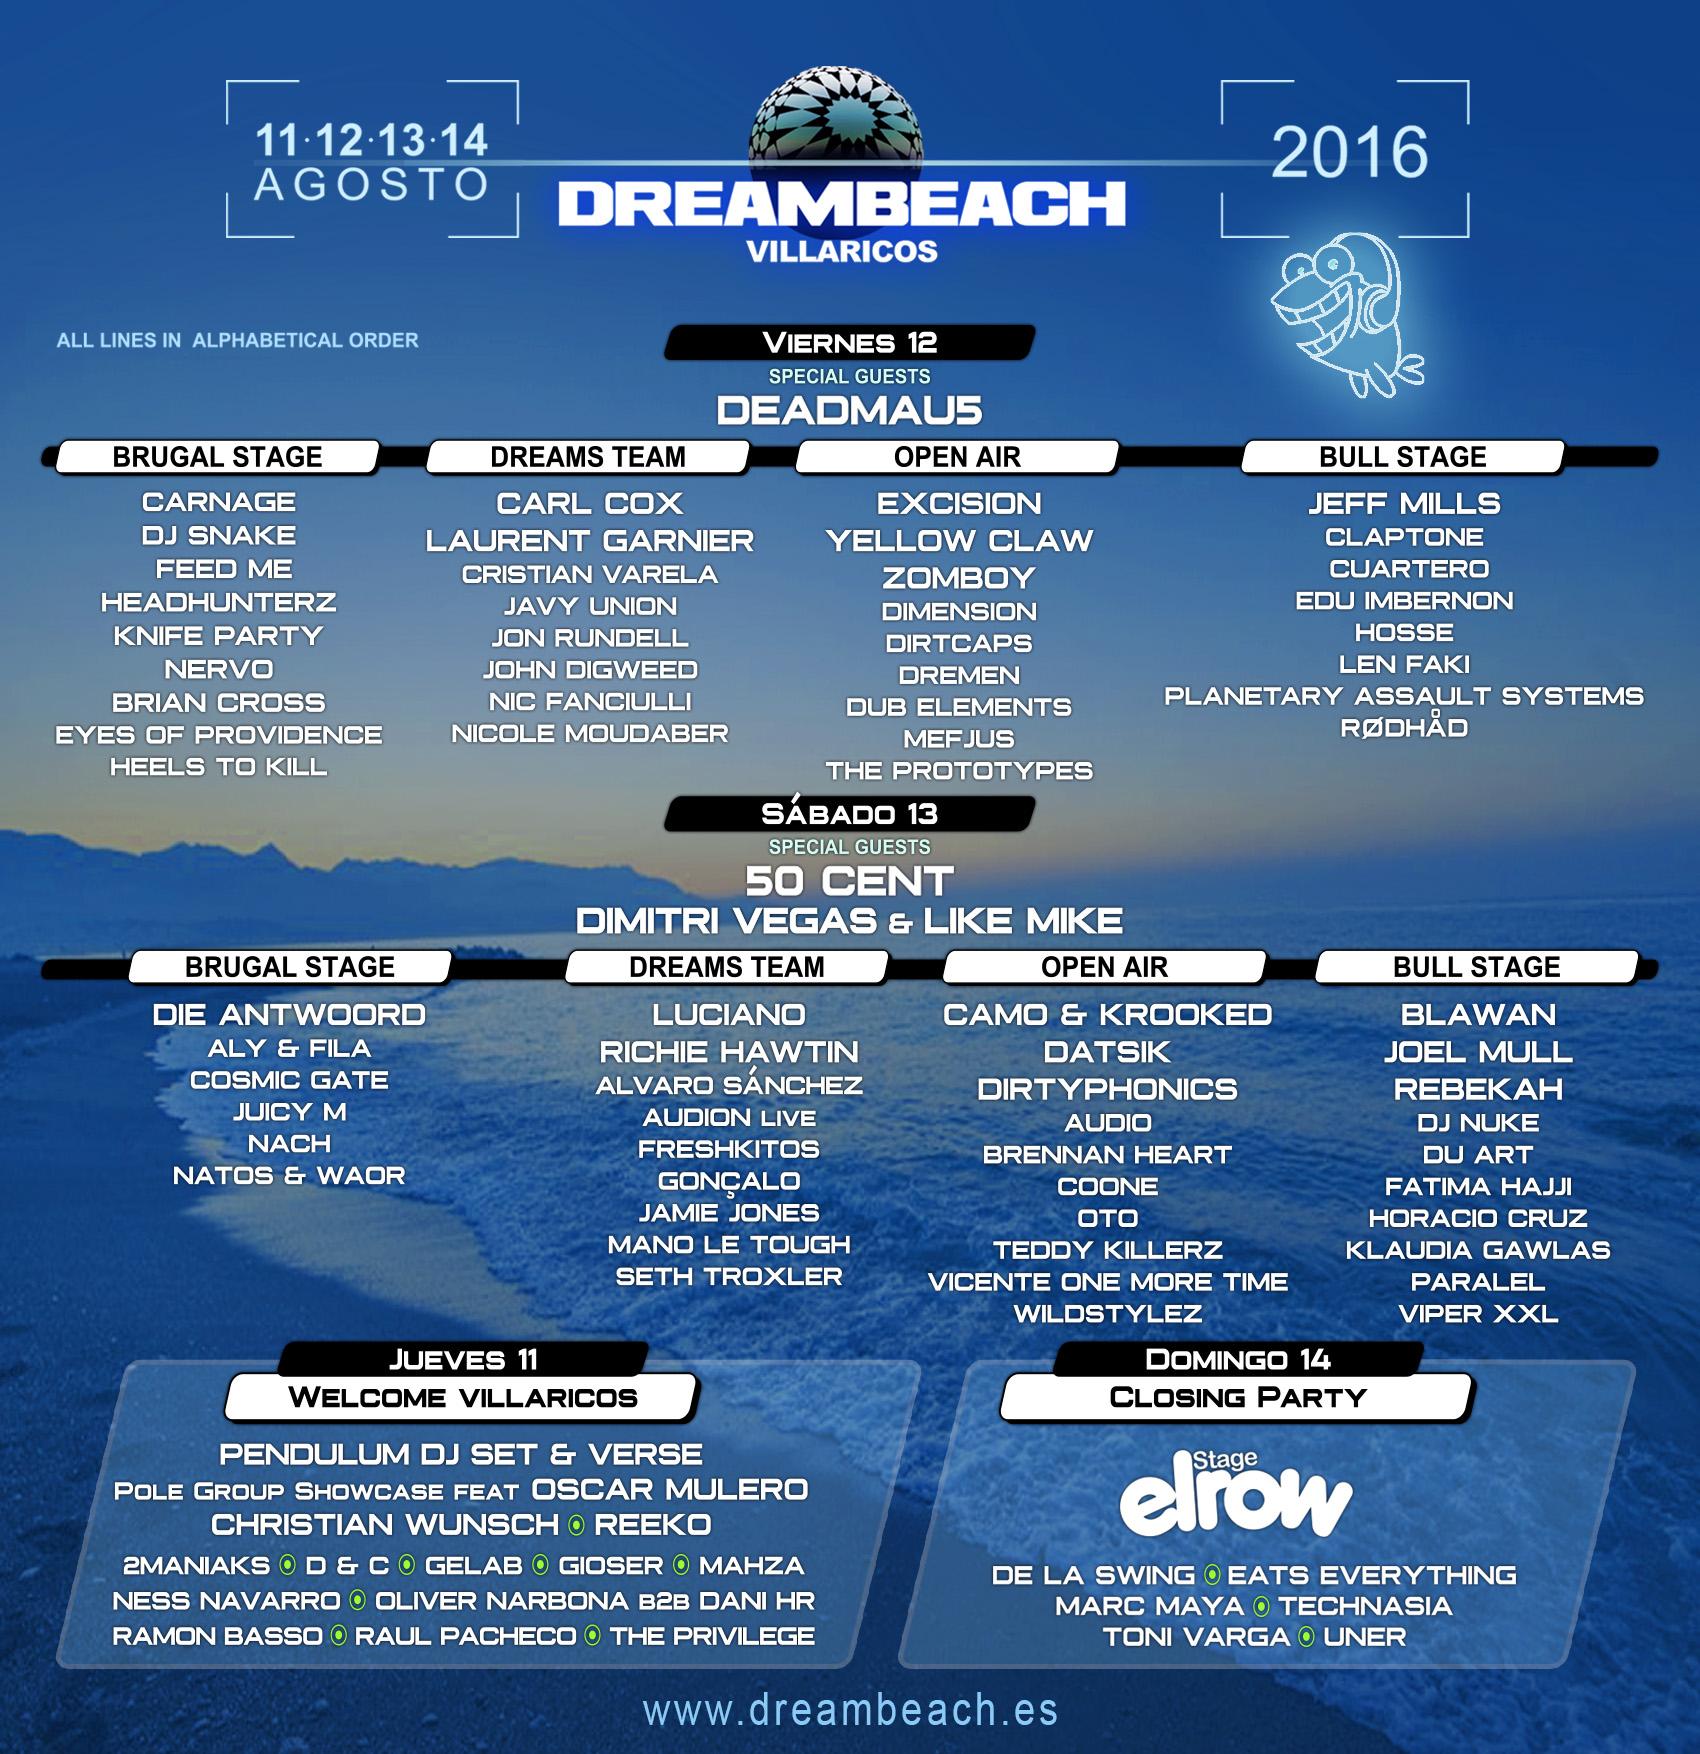 Dreambeach_ULTIMO